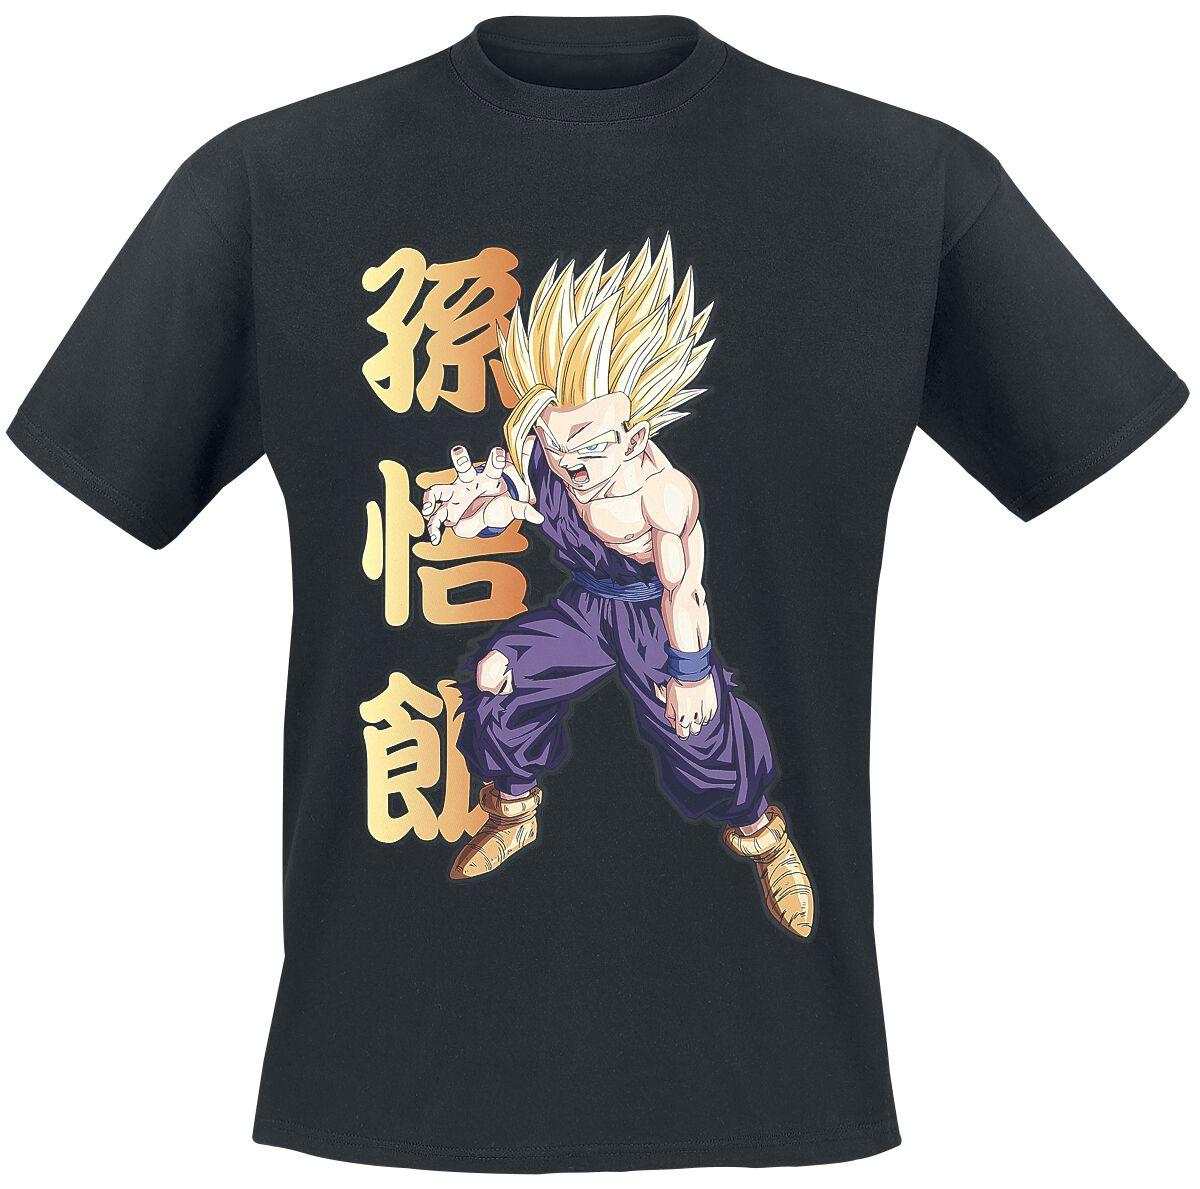 Merch dla Fanów - Koszulki - T-Shirt Dragon Ball Z - Gohan T-Shirt czarny - 374312